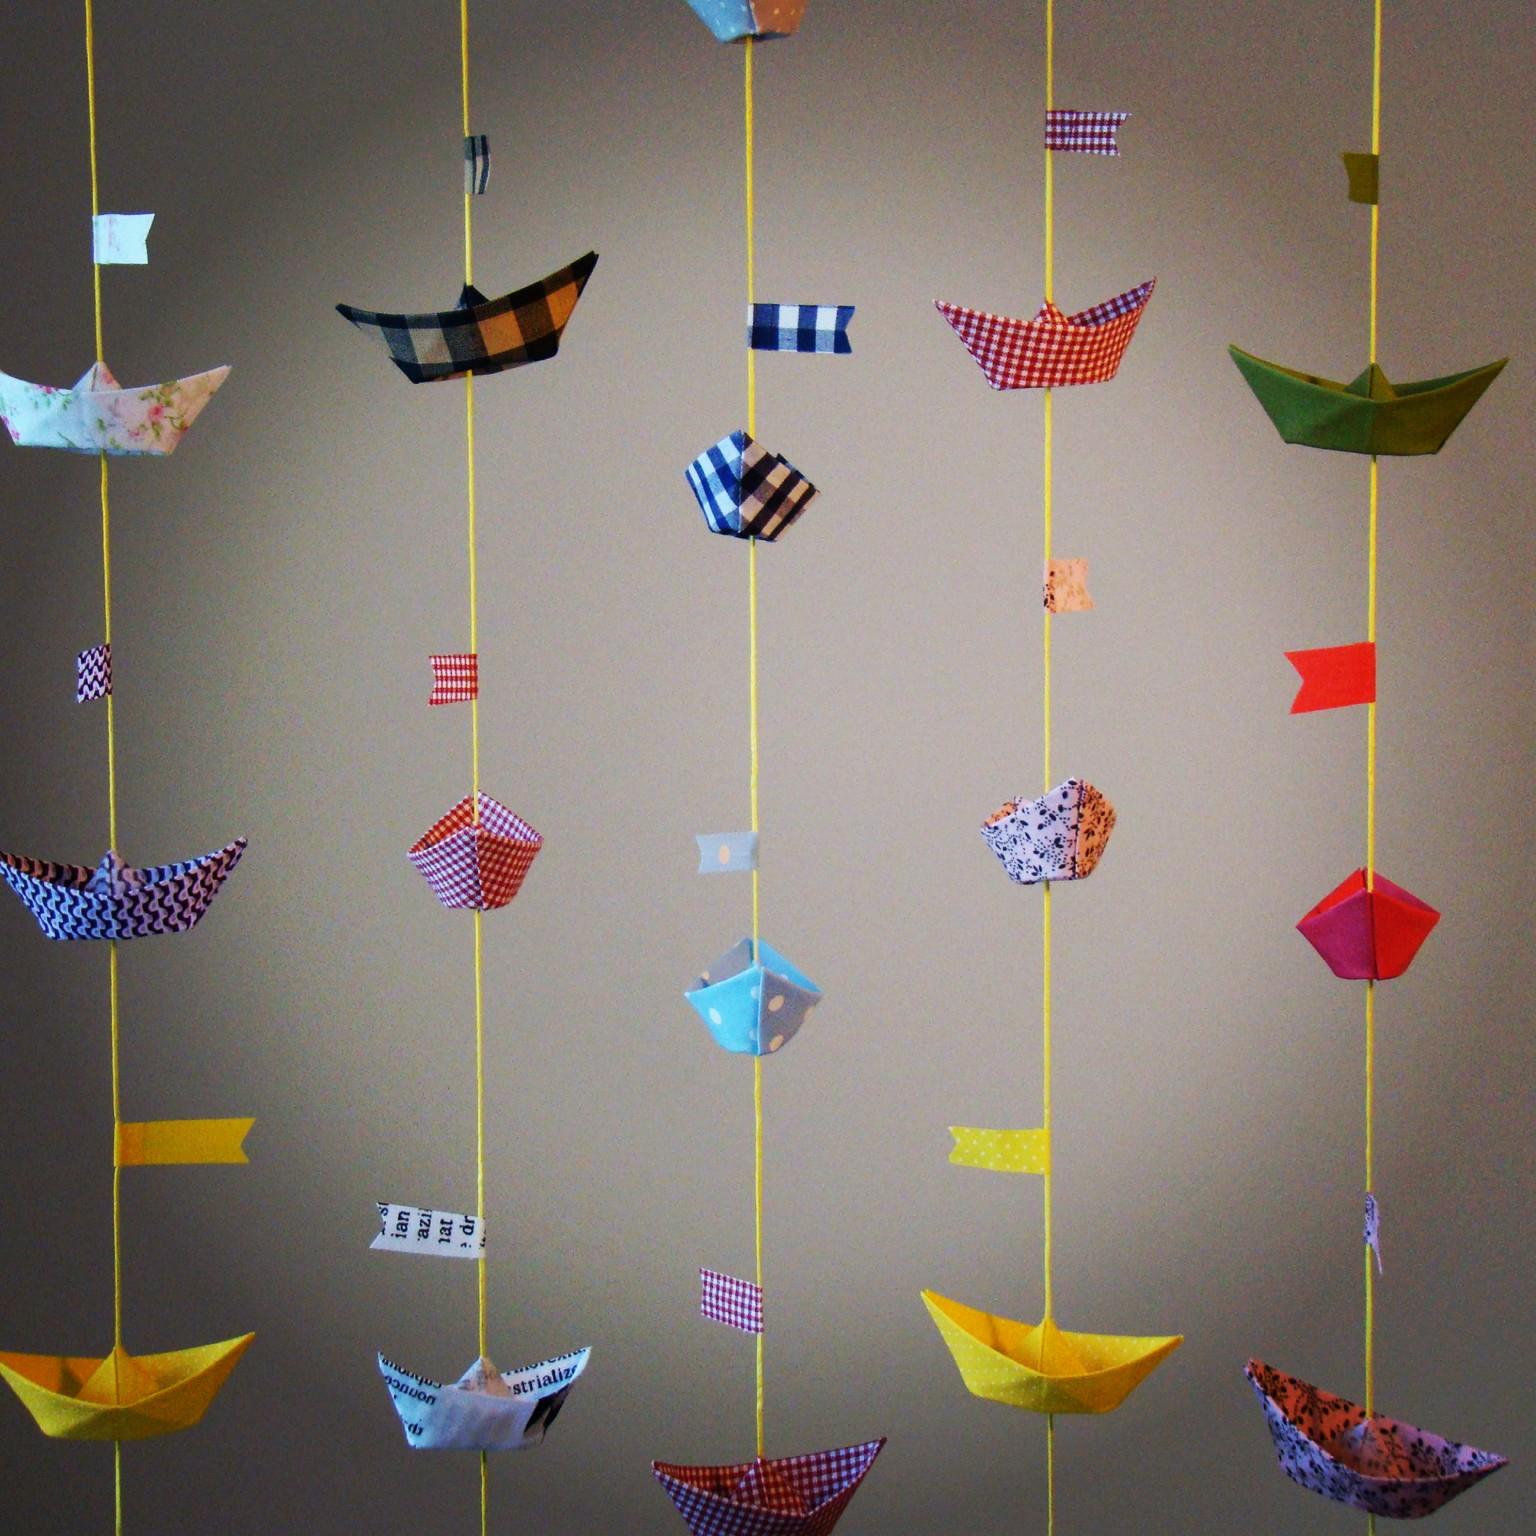 1000 images about mobile on pinterest mobiles origami. Black Bedroom Furniture Sets. Home Design Ideas